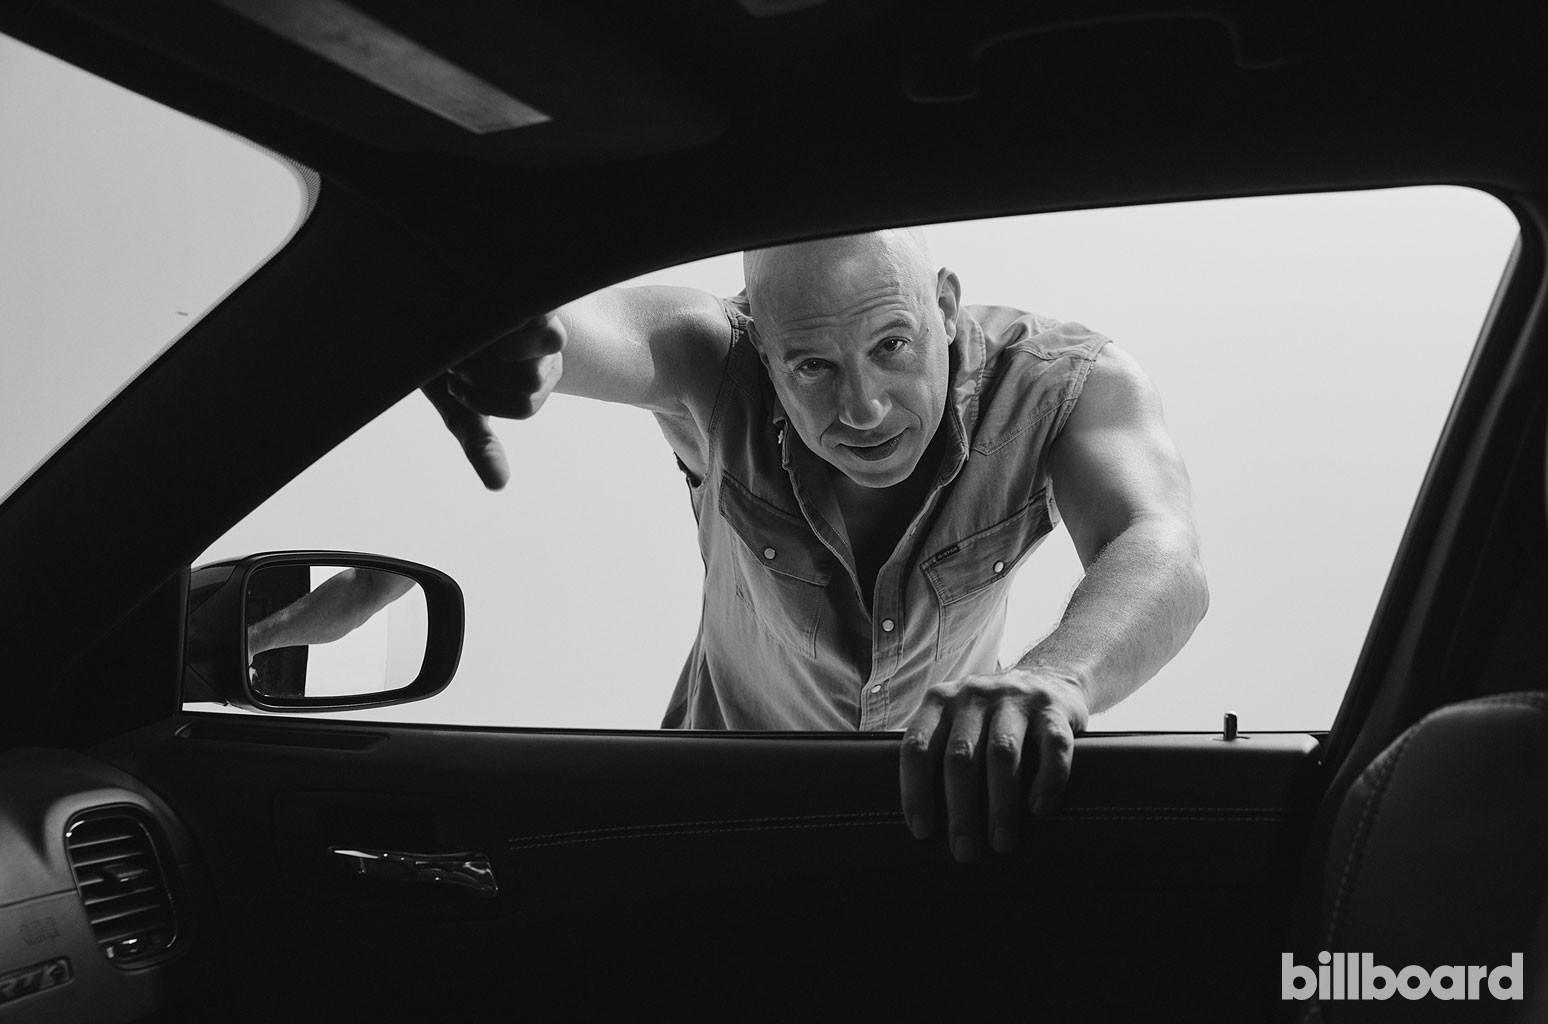 Vin Diesel photographed by Austin Hargrave